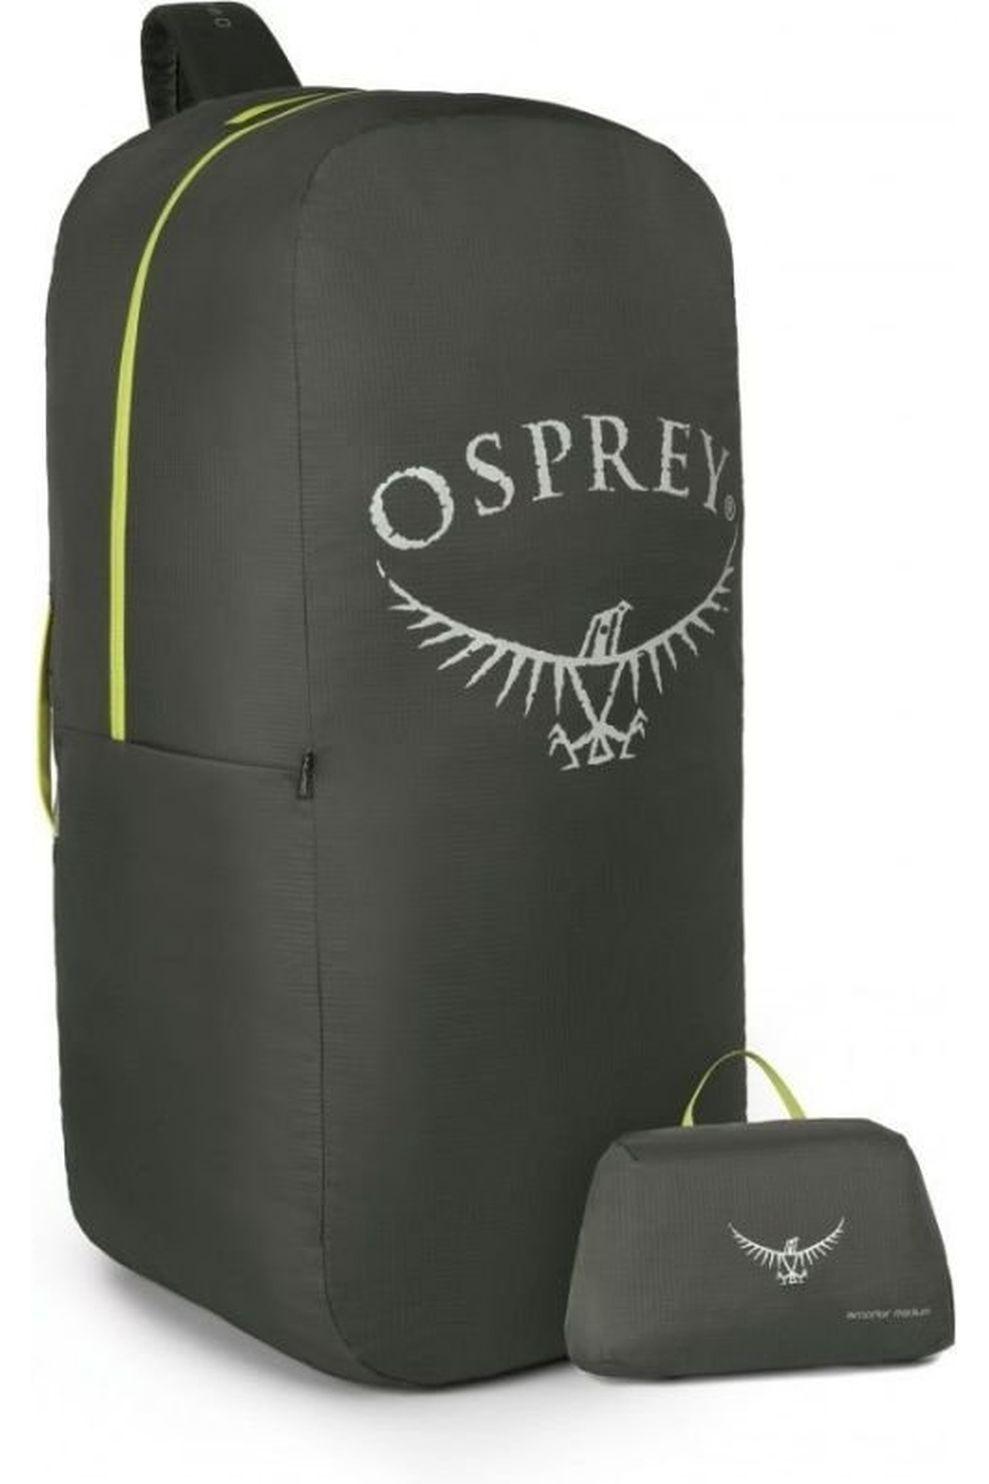 Osprey Rugzak Accessoire Airporter M - Grijs - Maat: M